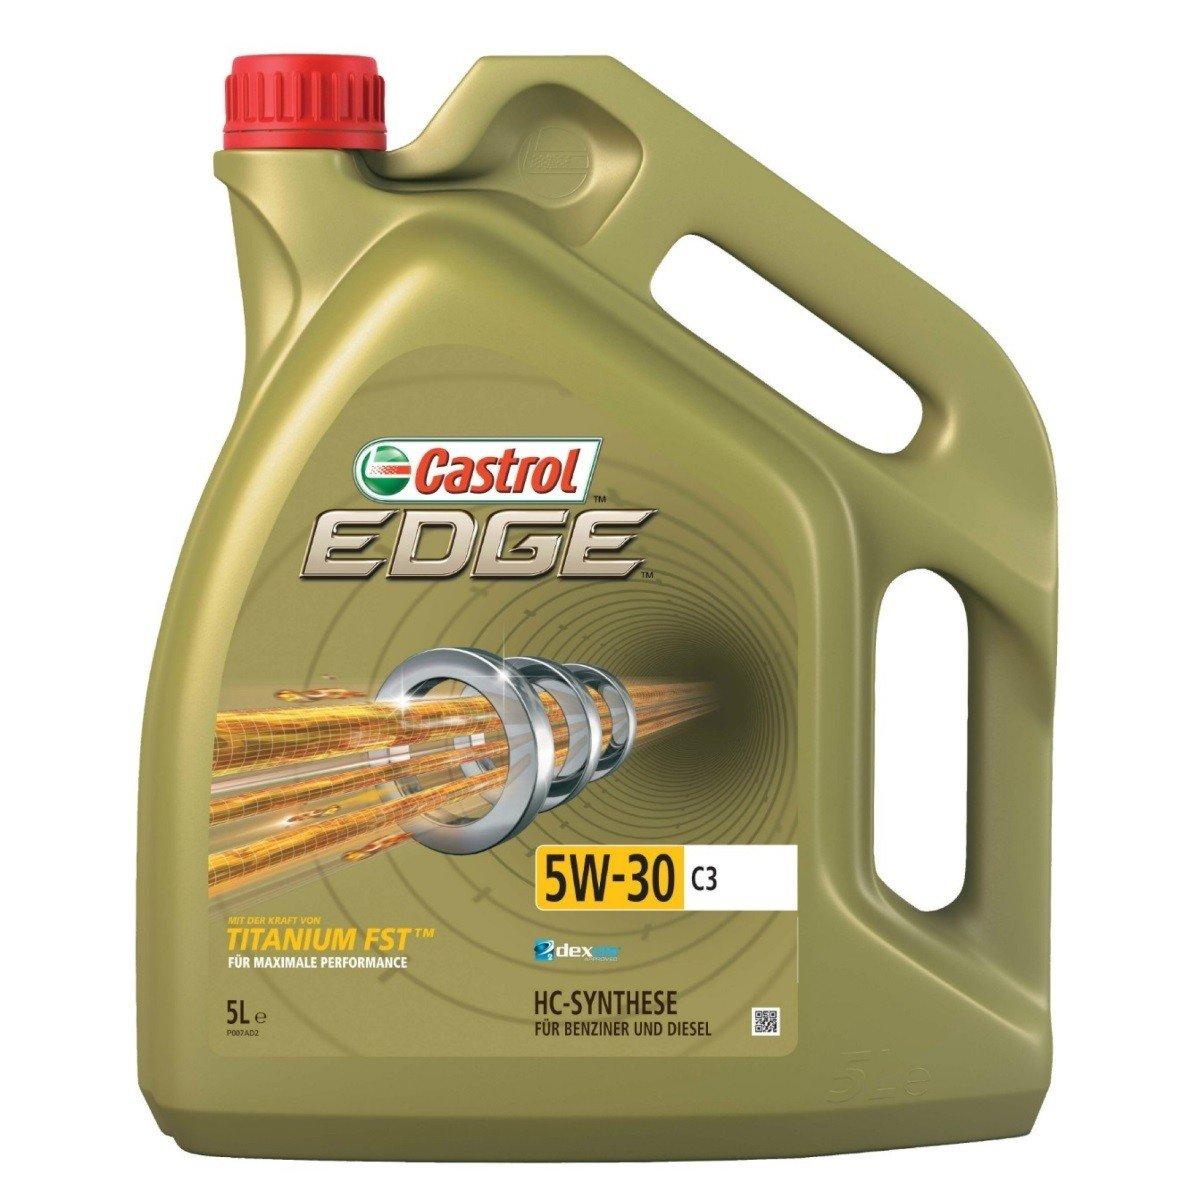 Castrol Edge 5W-30 C3 Titanium FST 5L